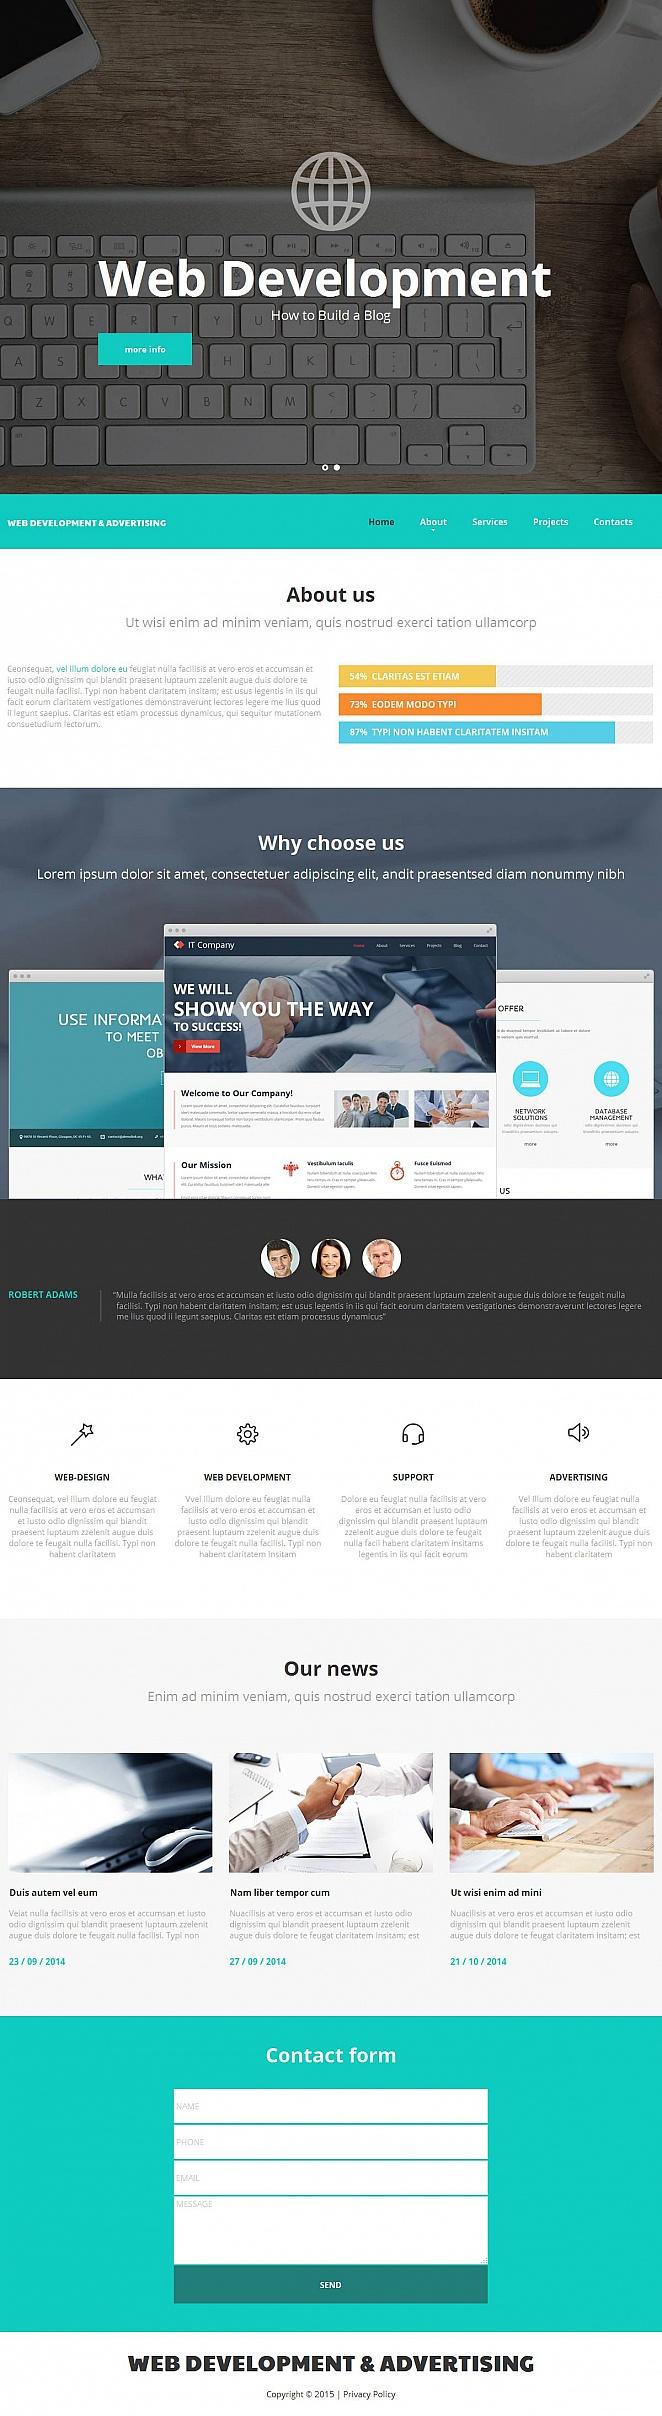 Web Development Company Website Template - image